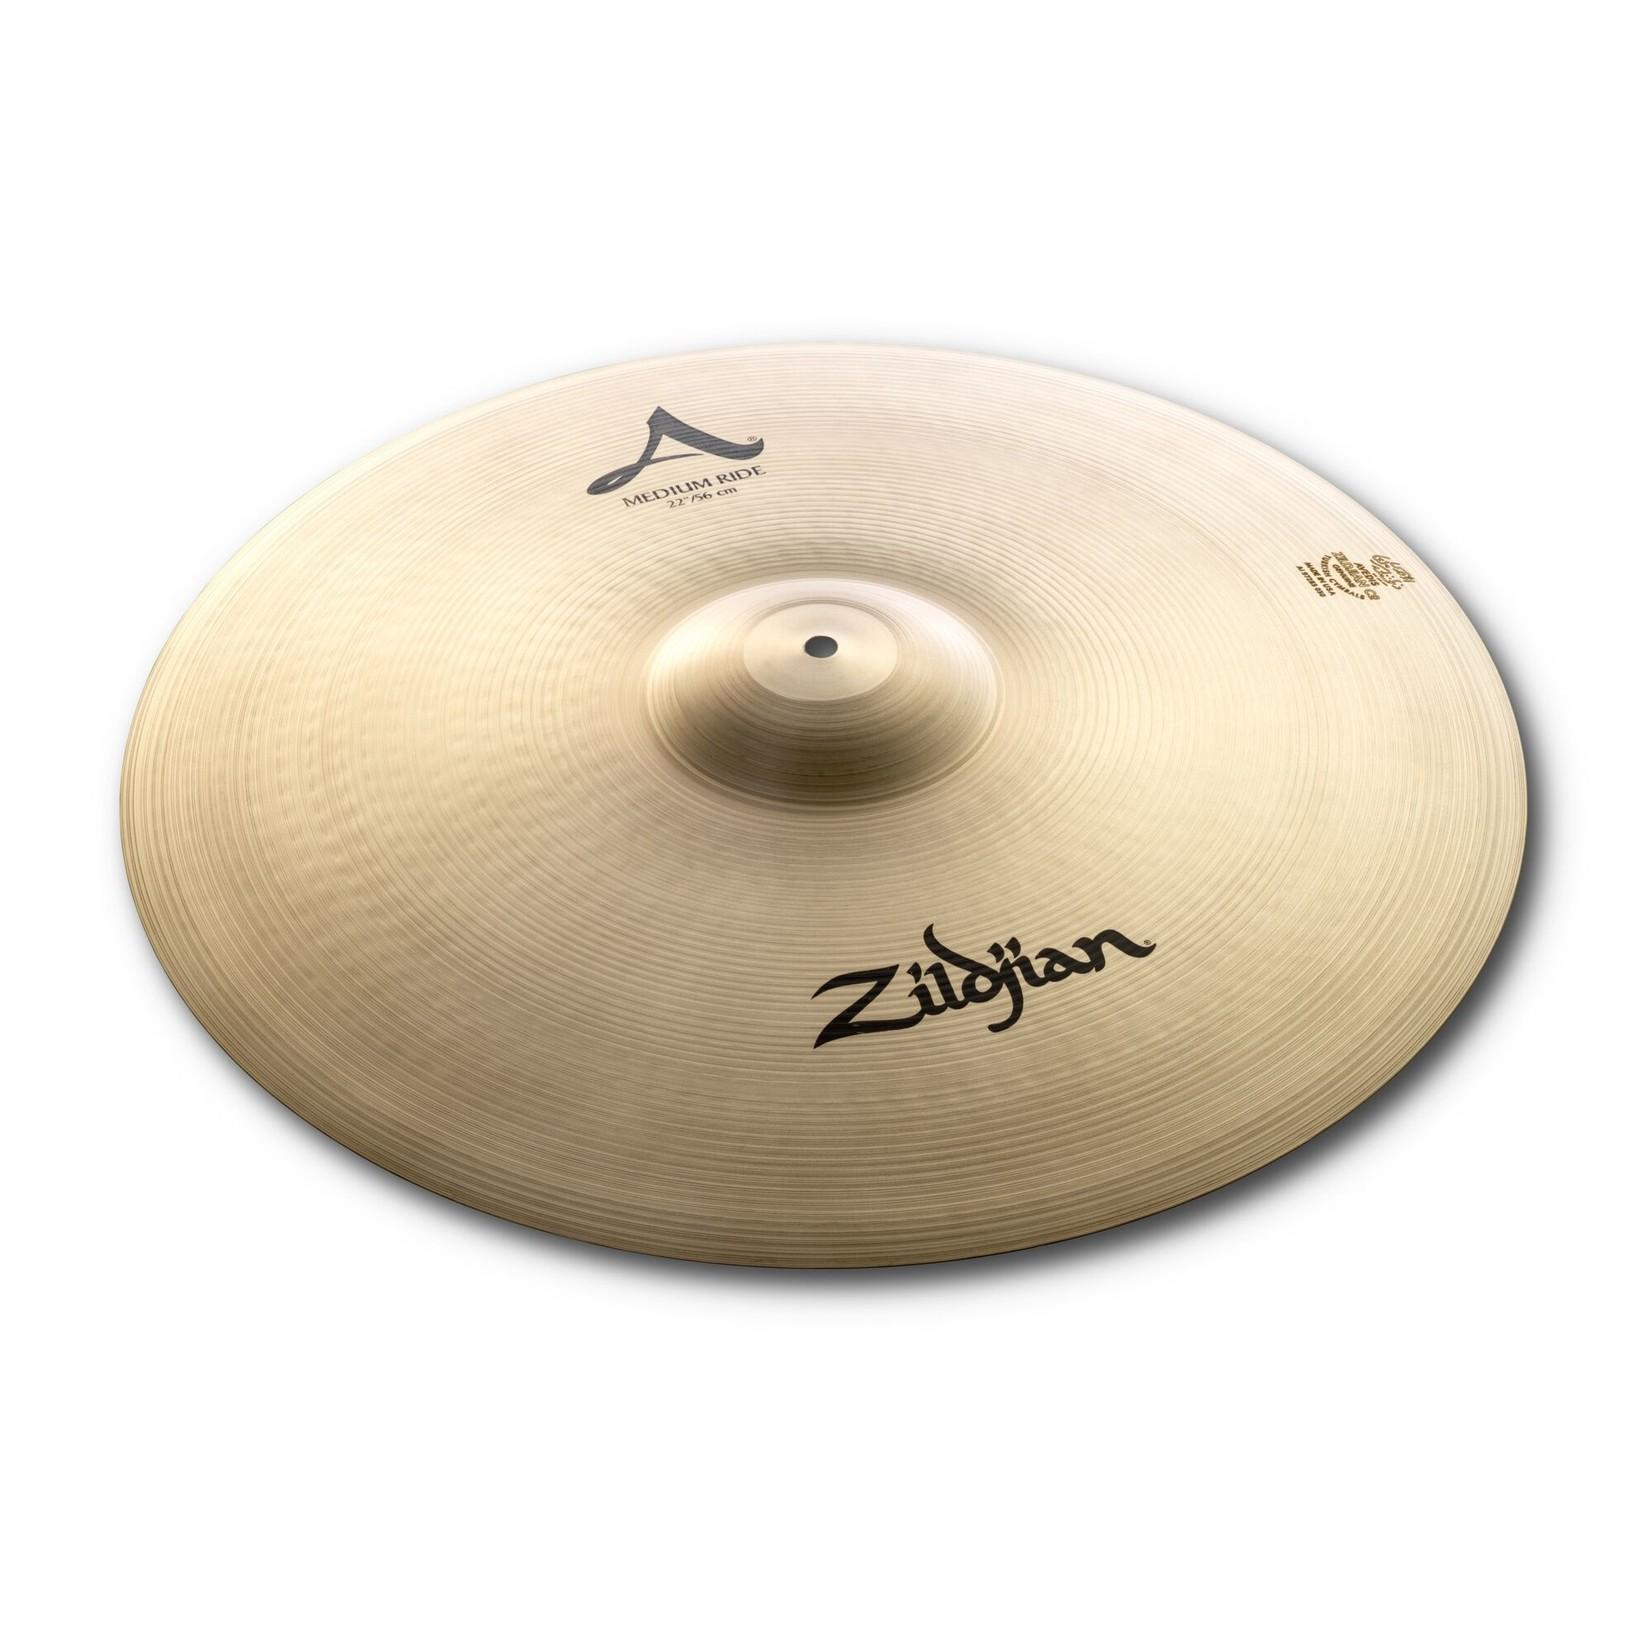 "Zildjian Zildjian 22"" A Zildjian Medium Ride"